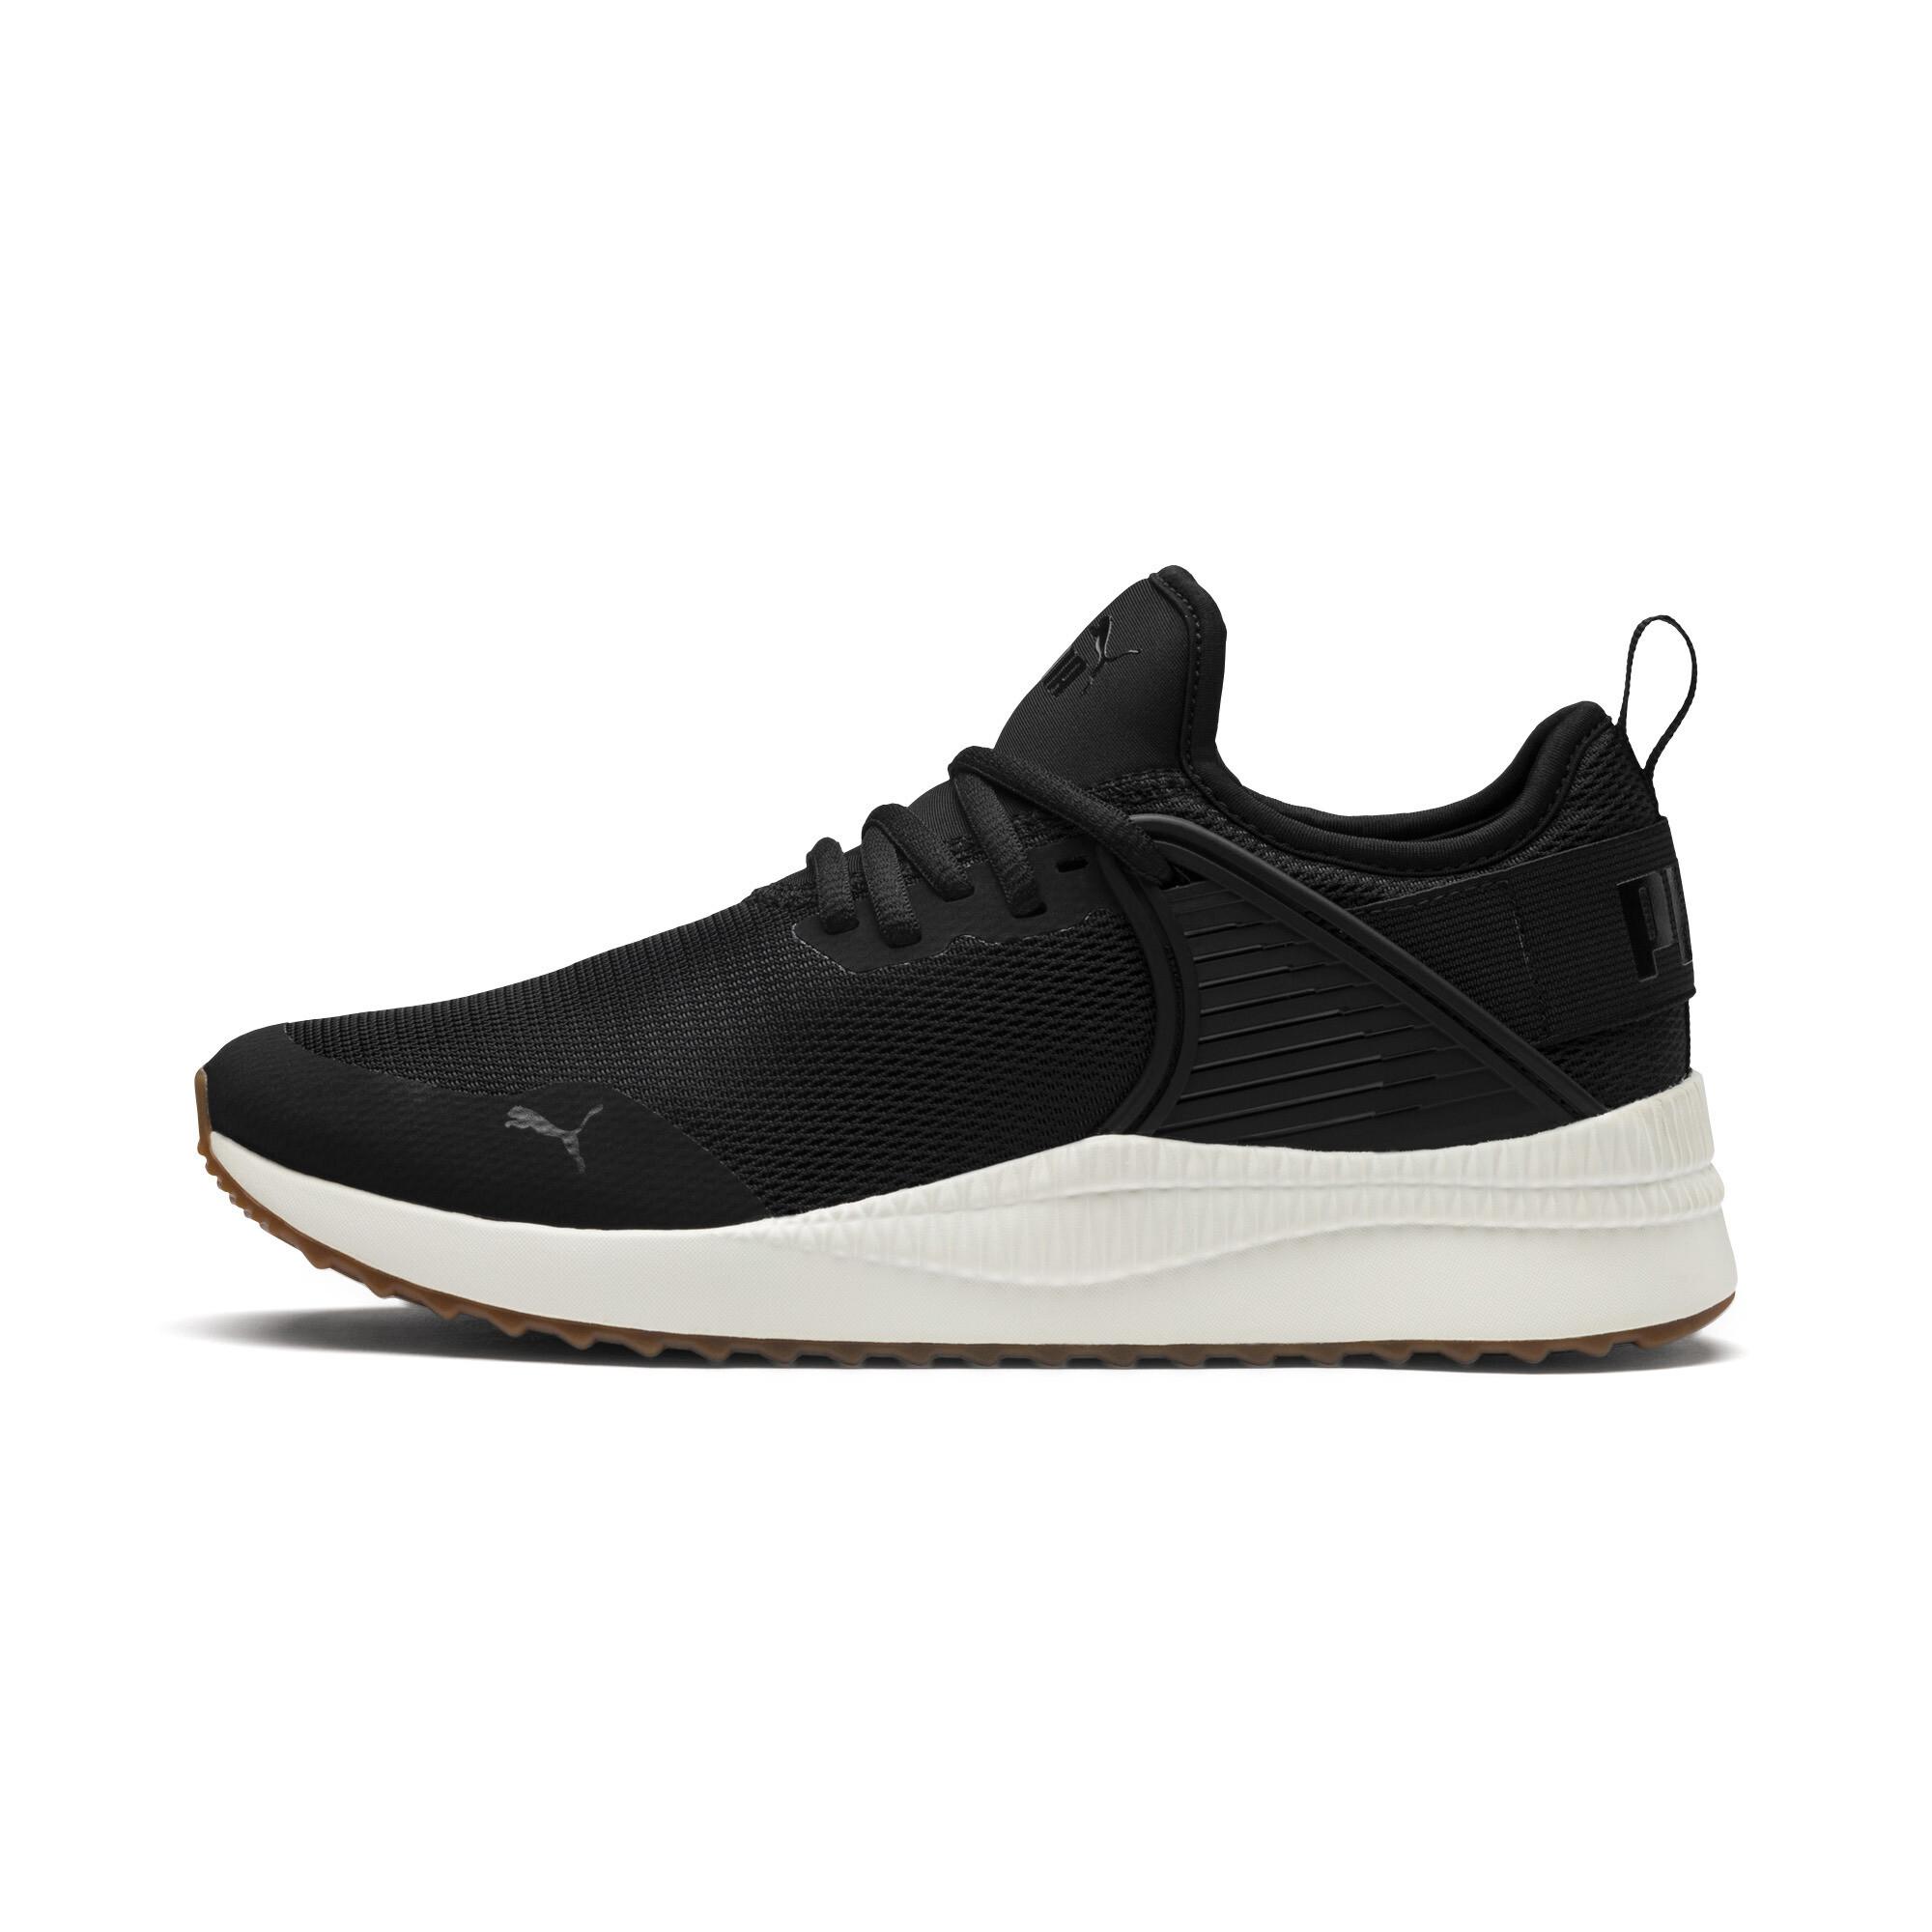 PUMA-Pacer-Next-Cage-Sneakers-Men-Shoe-Basics thumbnail 9